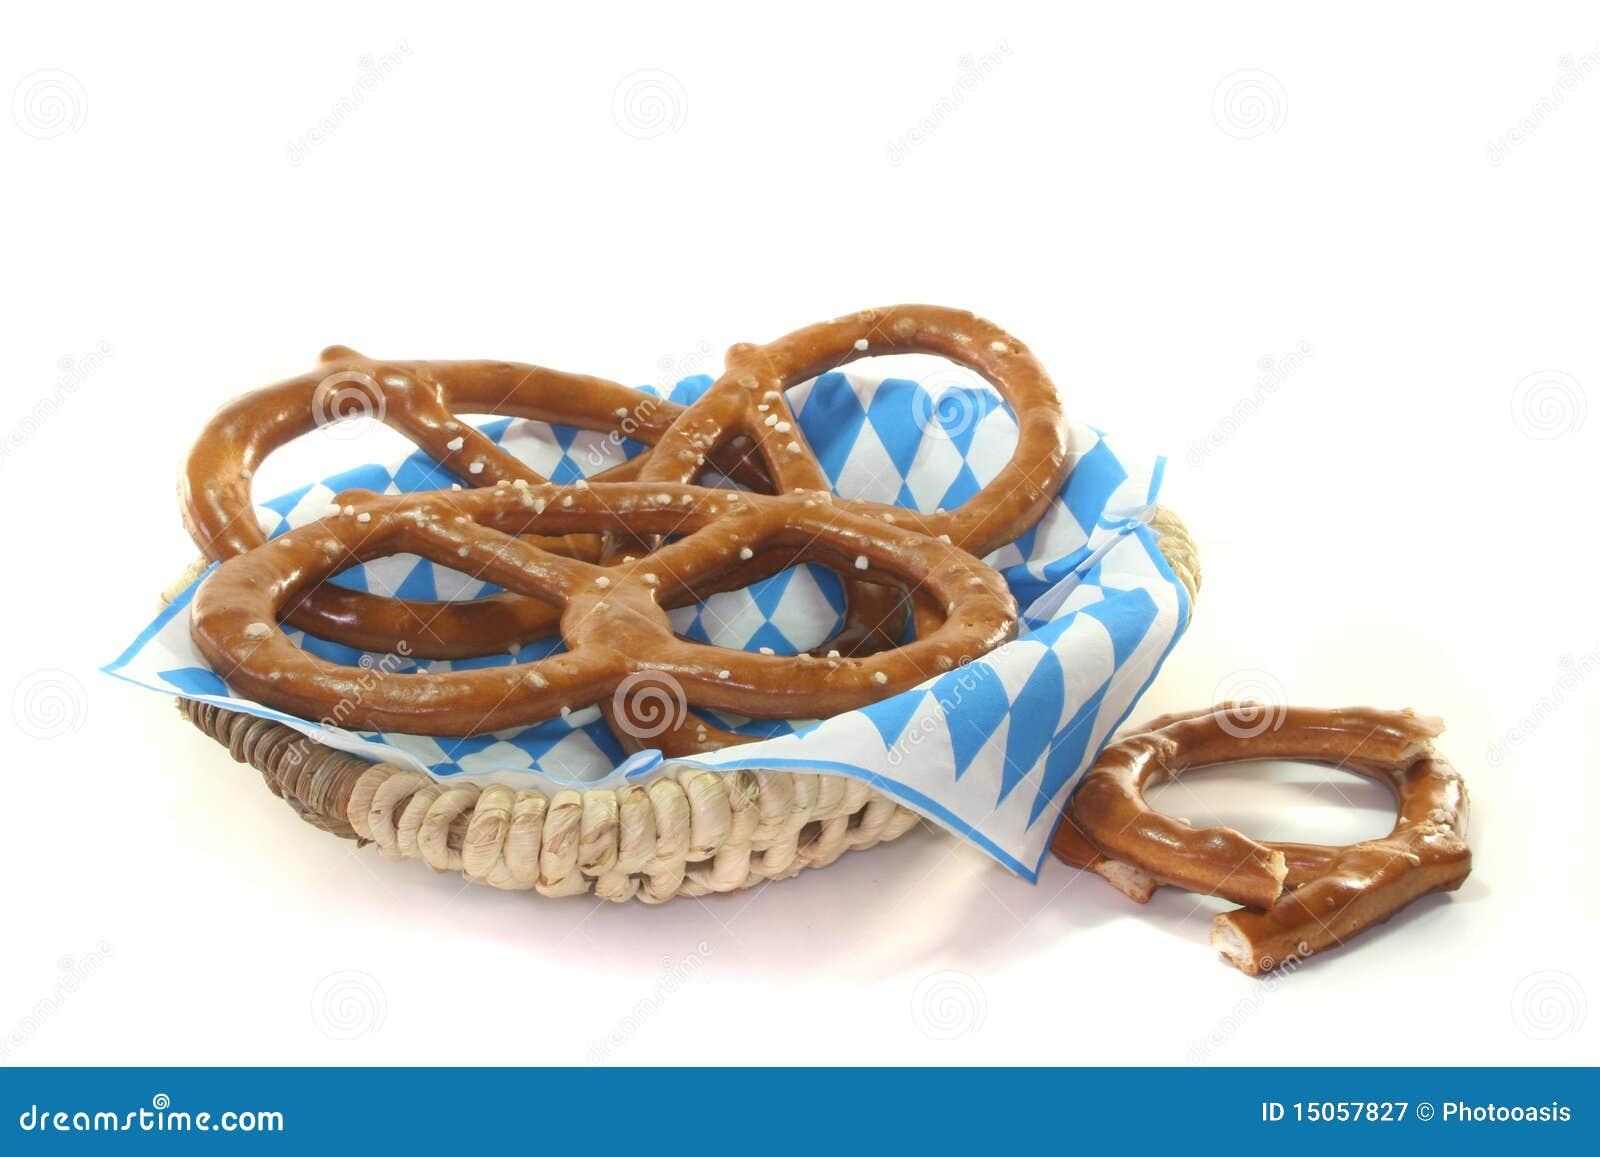 how to make german pretzels without lye